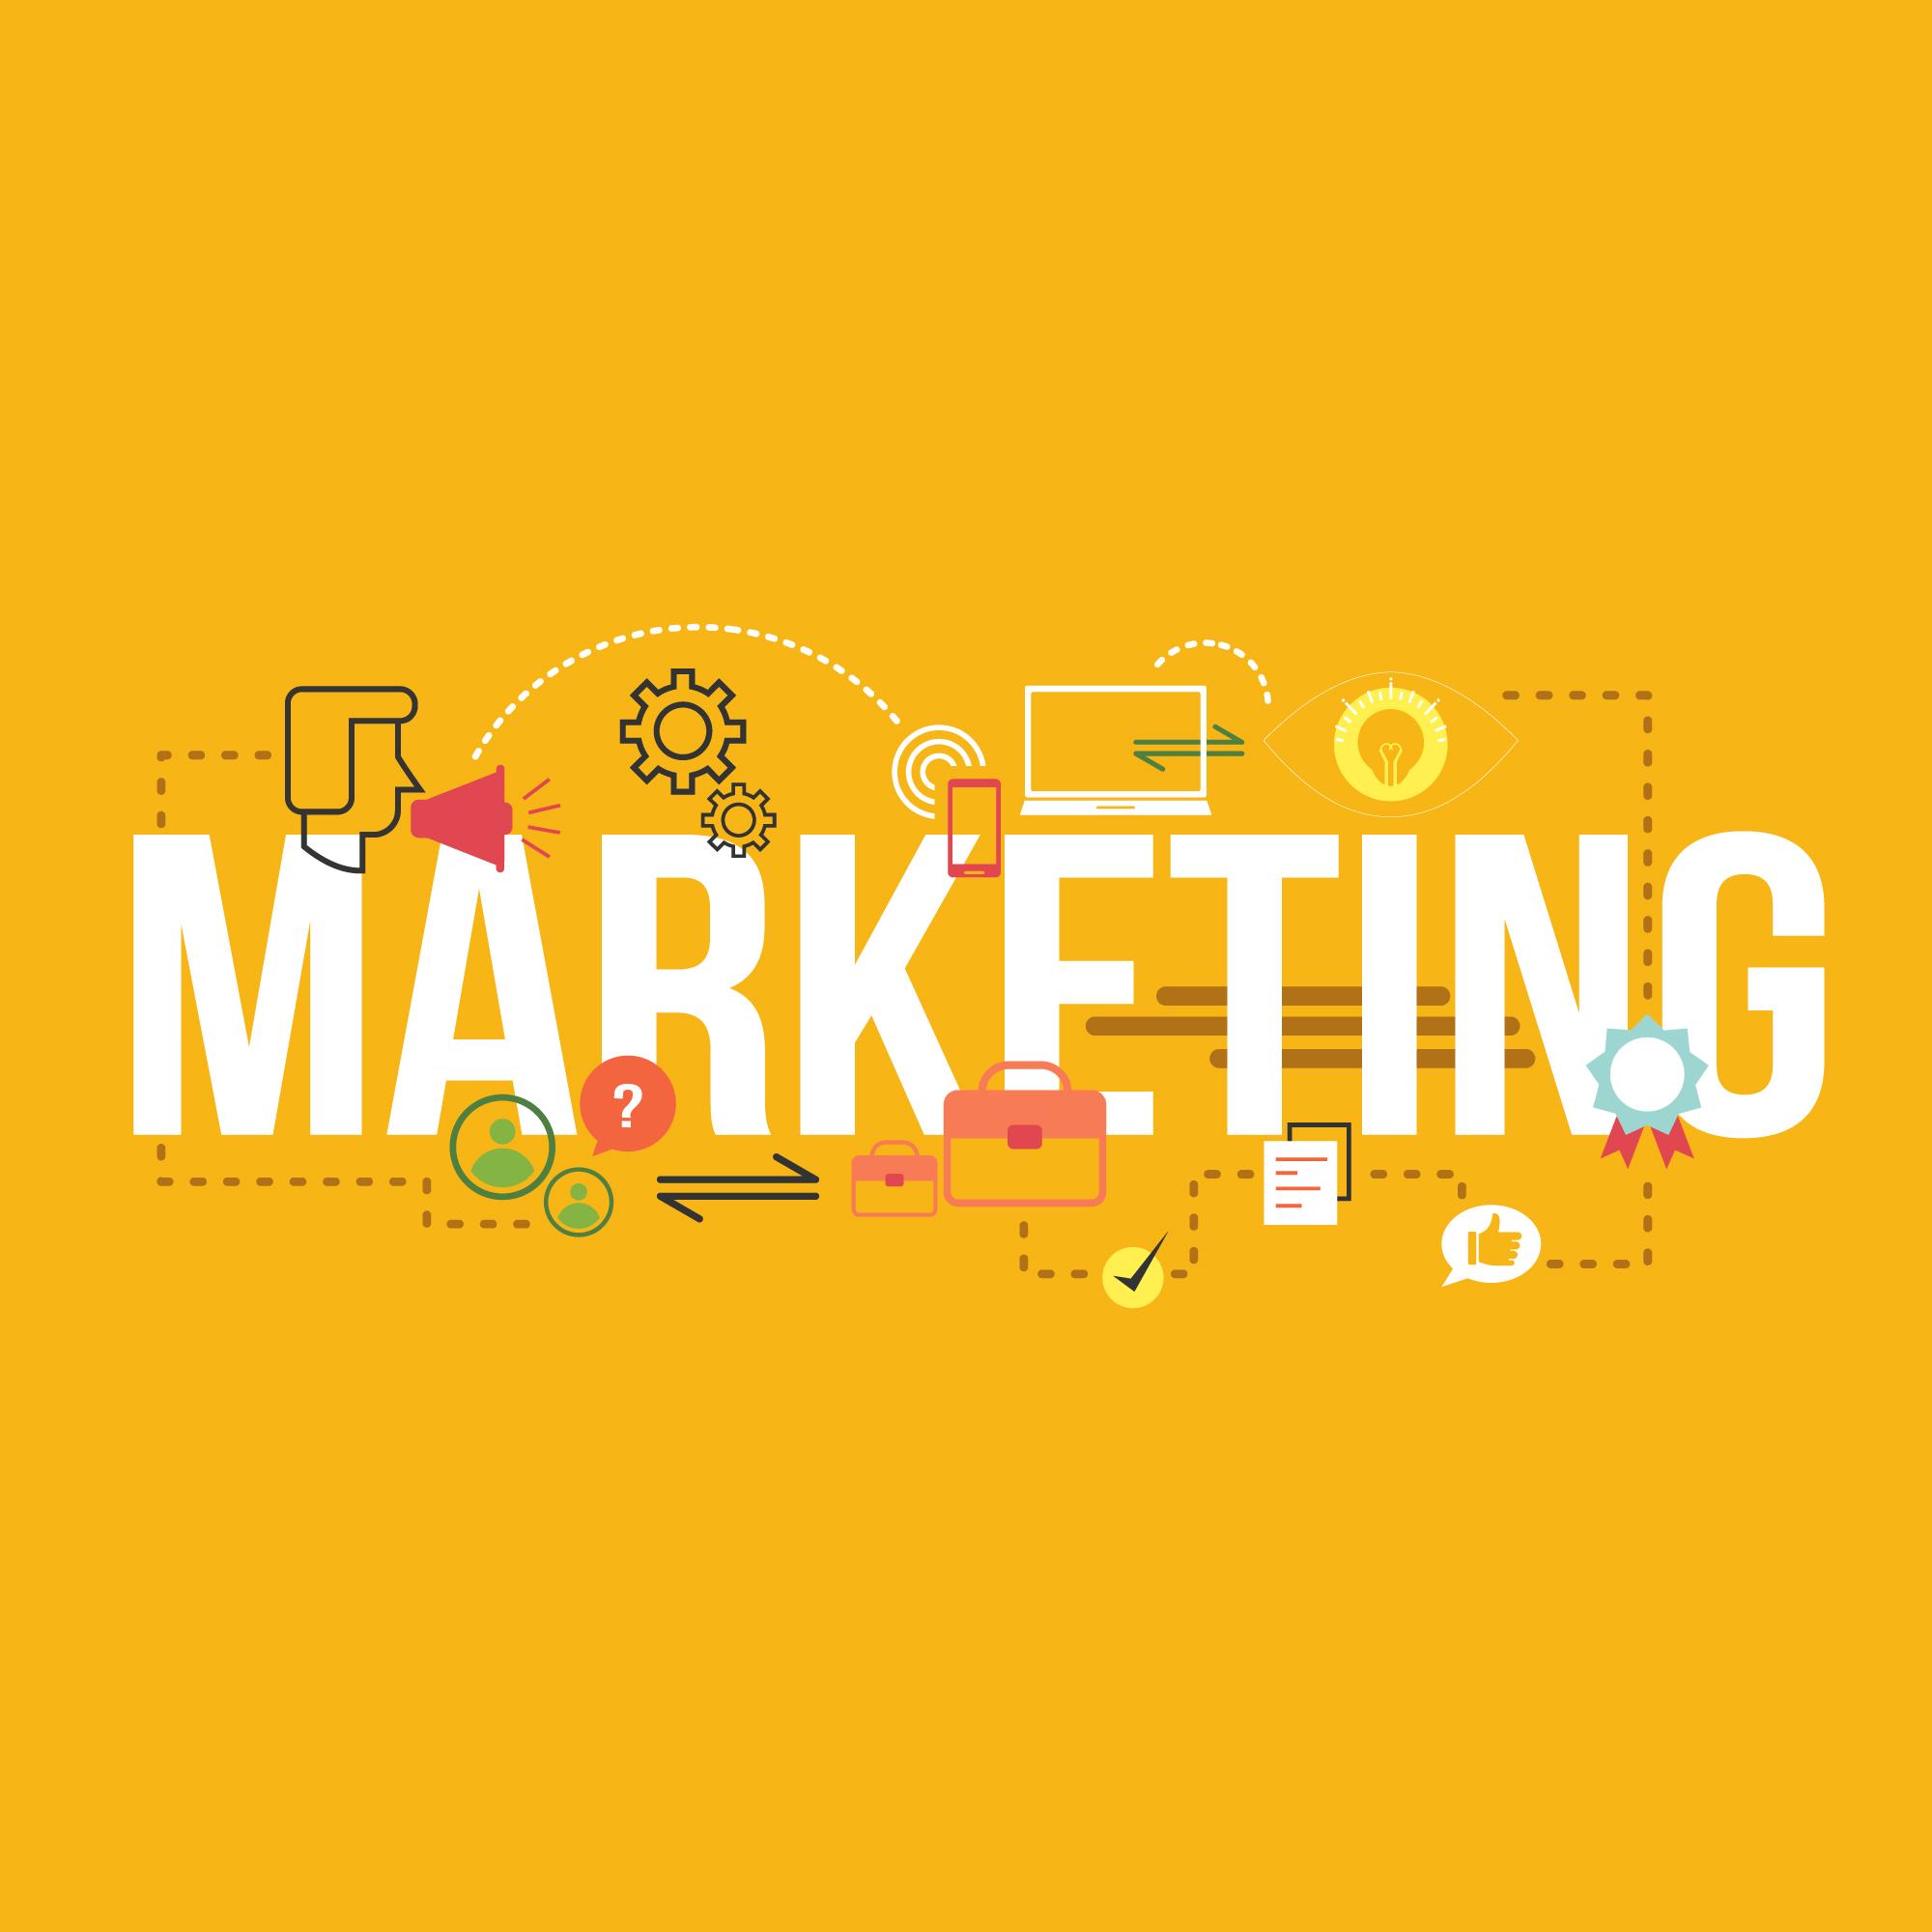 Four Benefits ofWhite Label Marketing